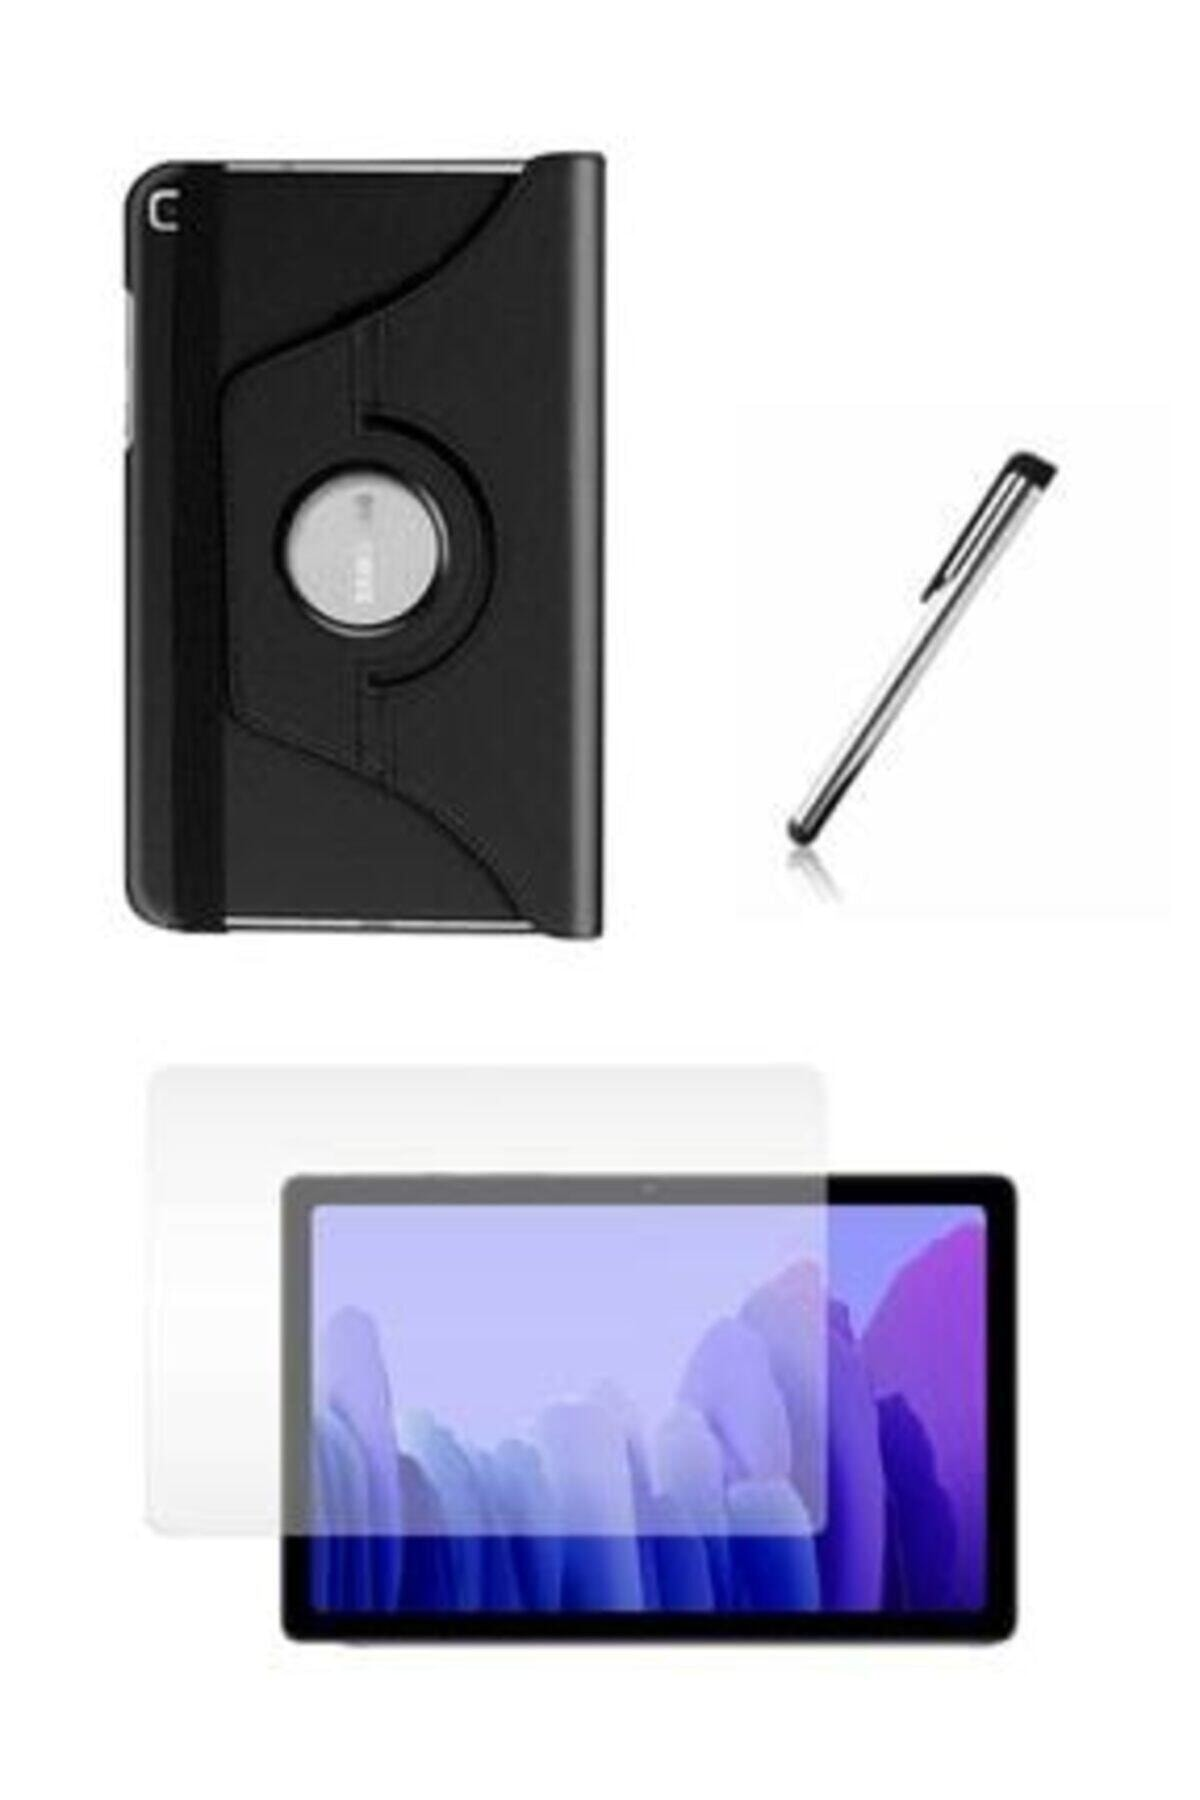 E TicaShop Samsung Galaxy Tab A7 Sm T500 T505 T507 Tablet Kılıfı Siyah Dönerli Seti 10,4 Inç Set 1